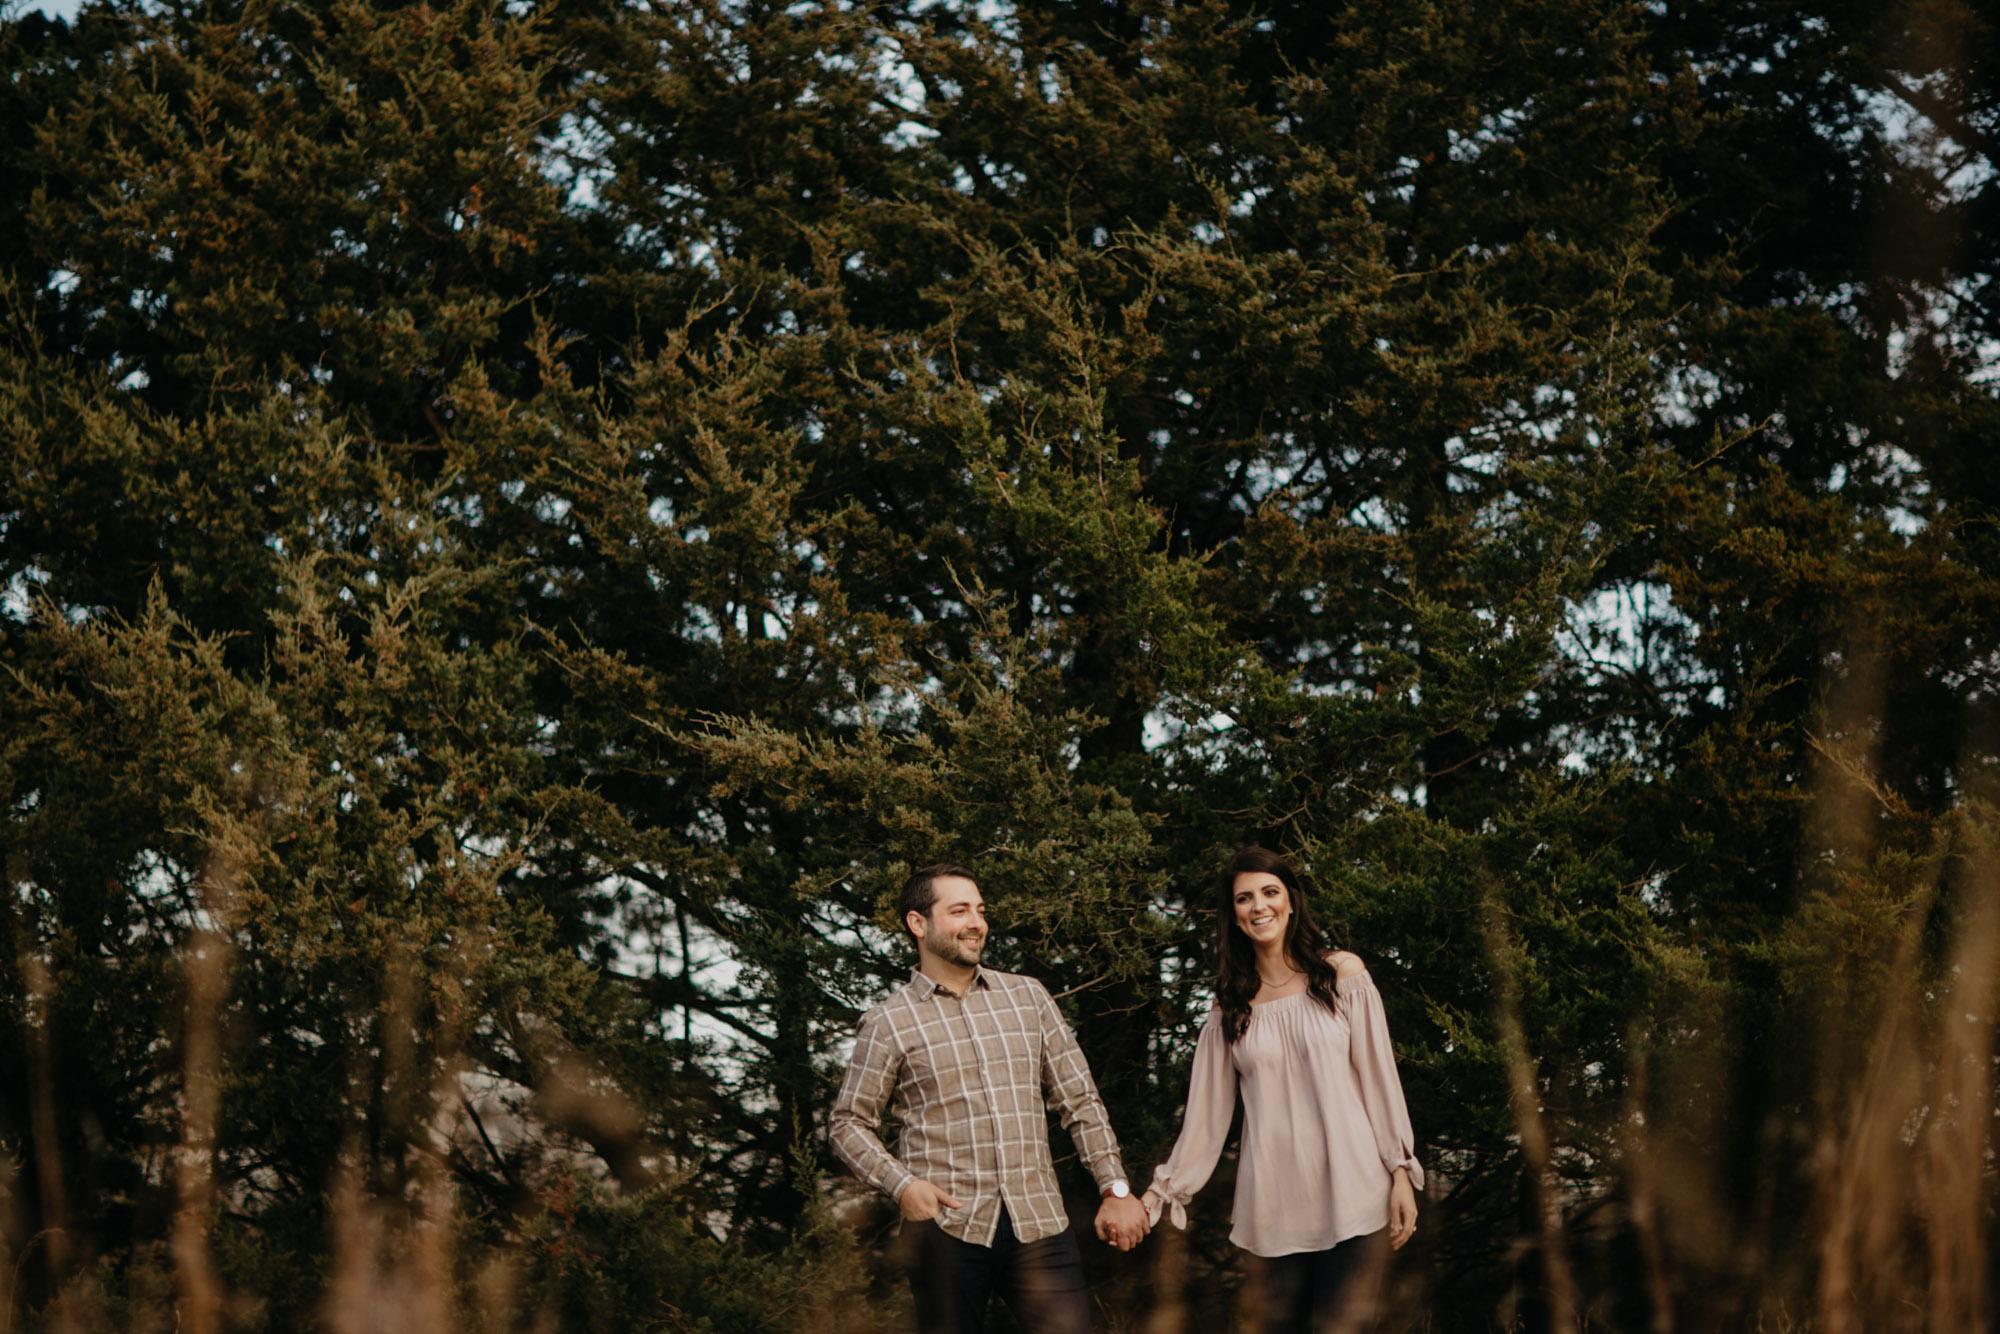 neale-woods-engagement-photographer-6.jpg